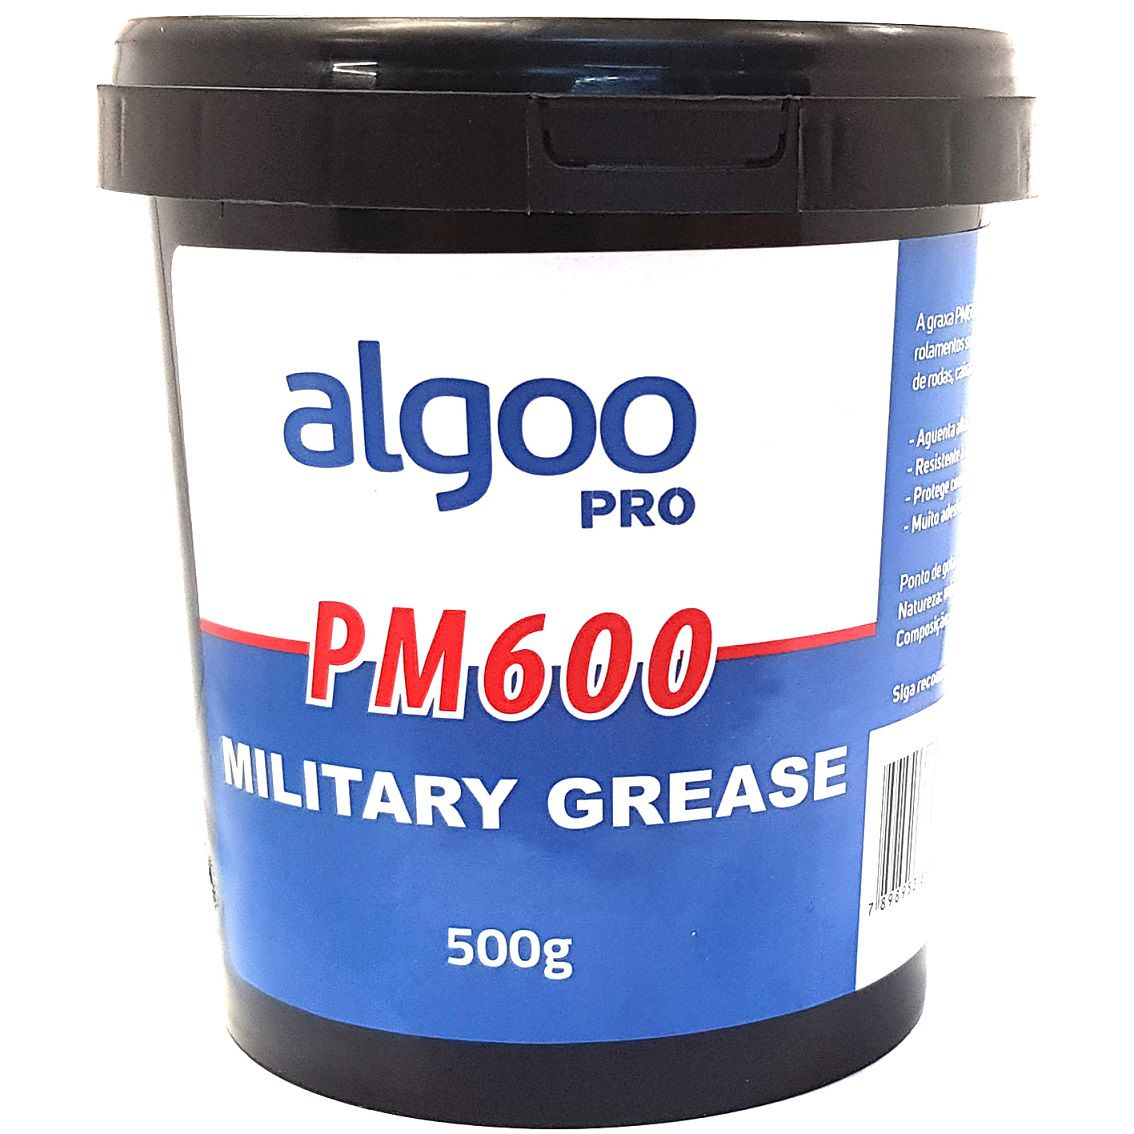 Graxa PM600 Military Grease Algoo Pro 500 gramas para Suspensão Bicicletas